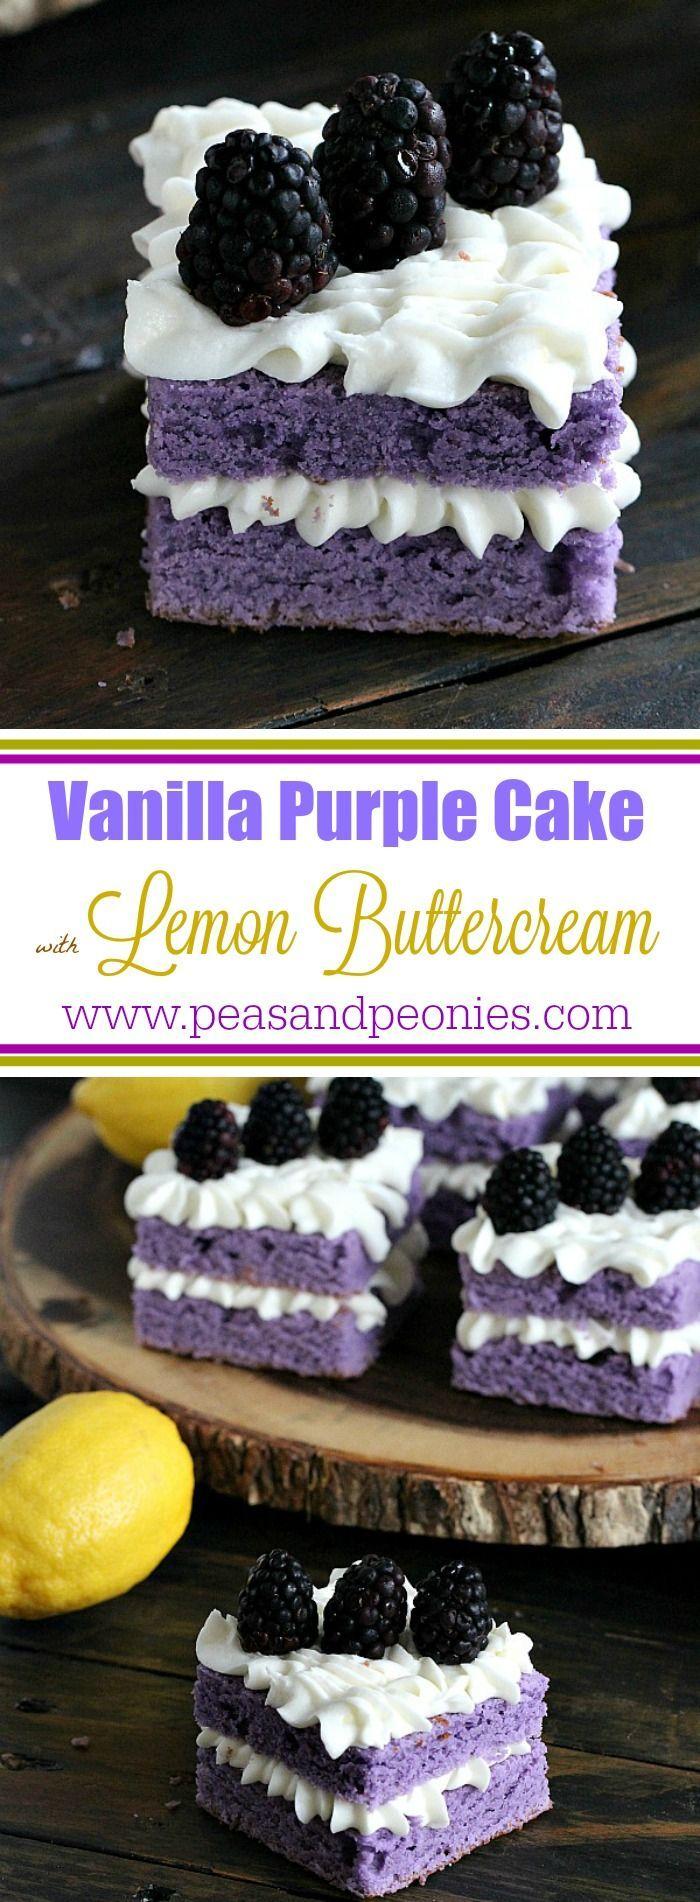 Vanilla Purple Cake with Lemon Buttercream is cut into mini